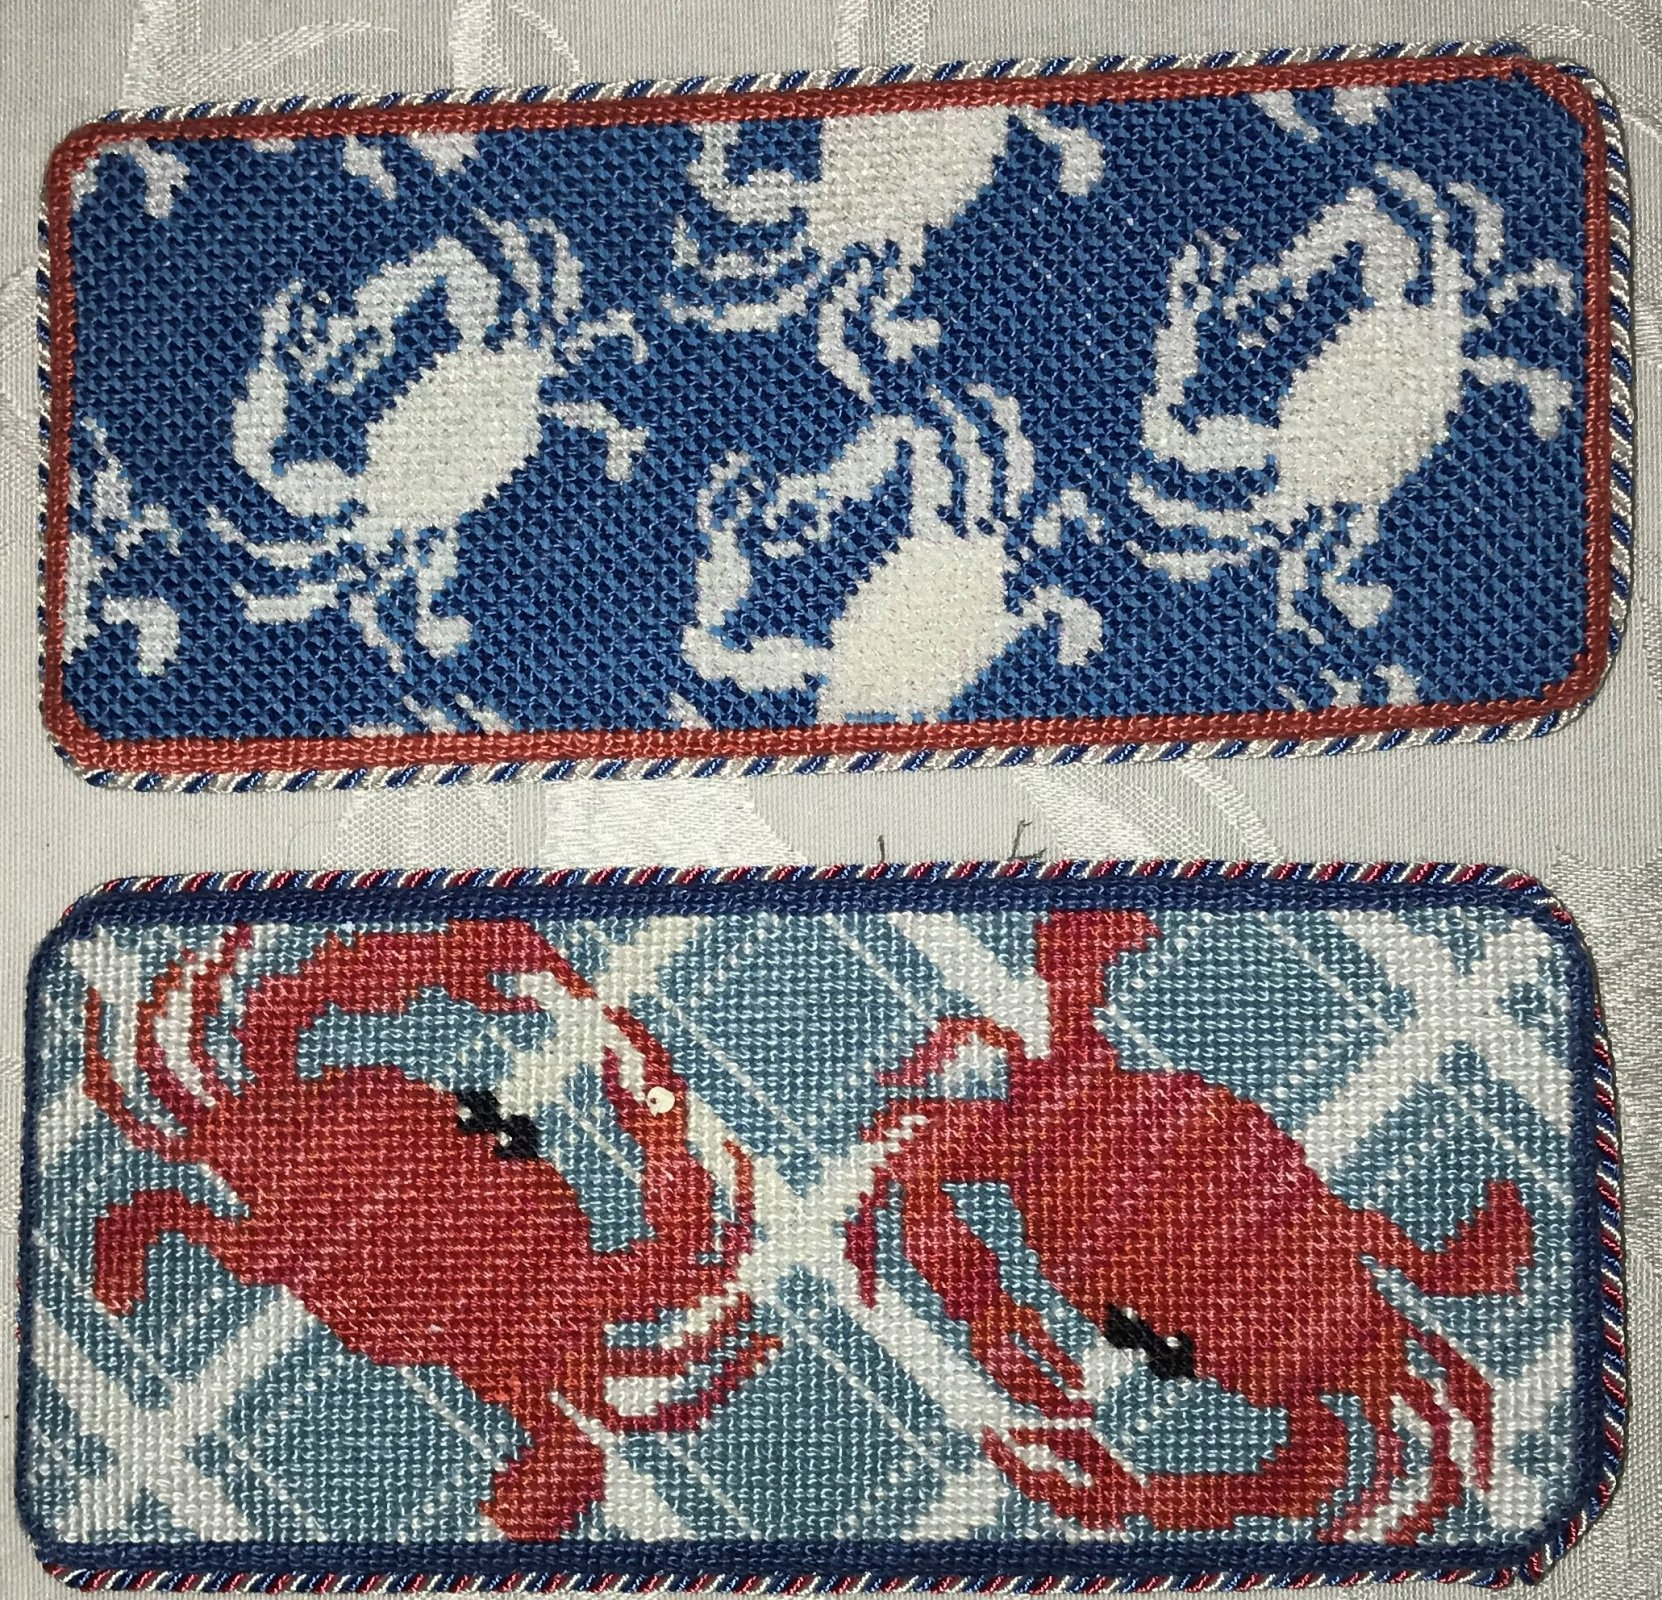 White Crab Eyeglasses Case - Stitched by Cynthia B.